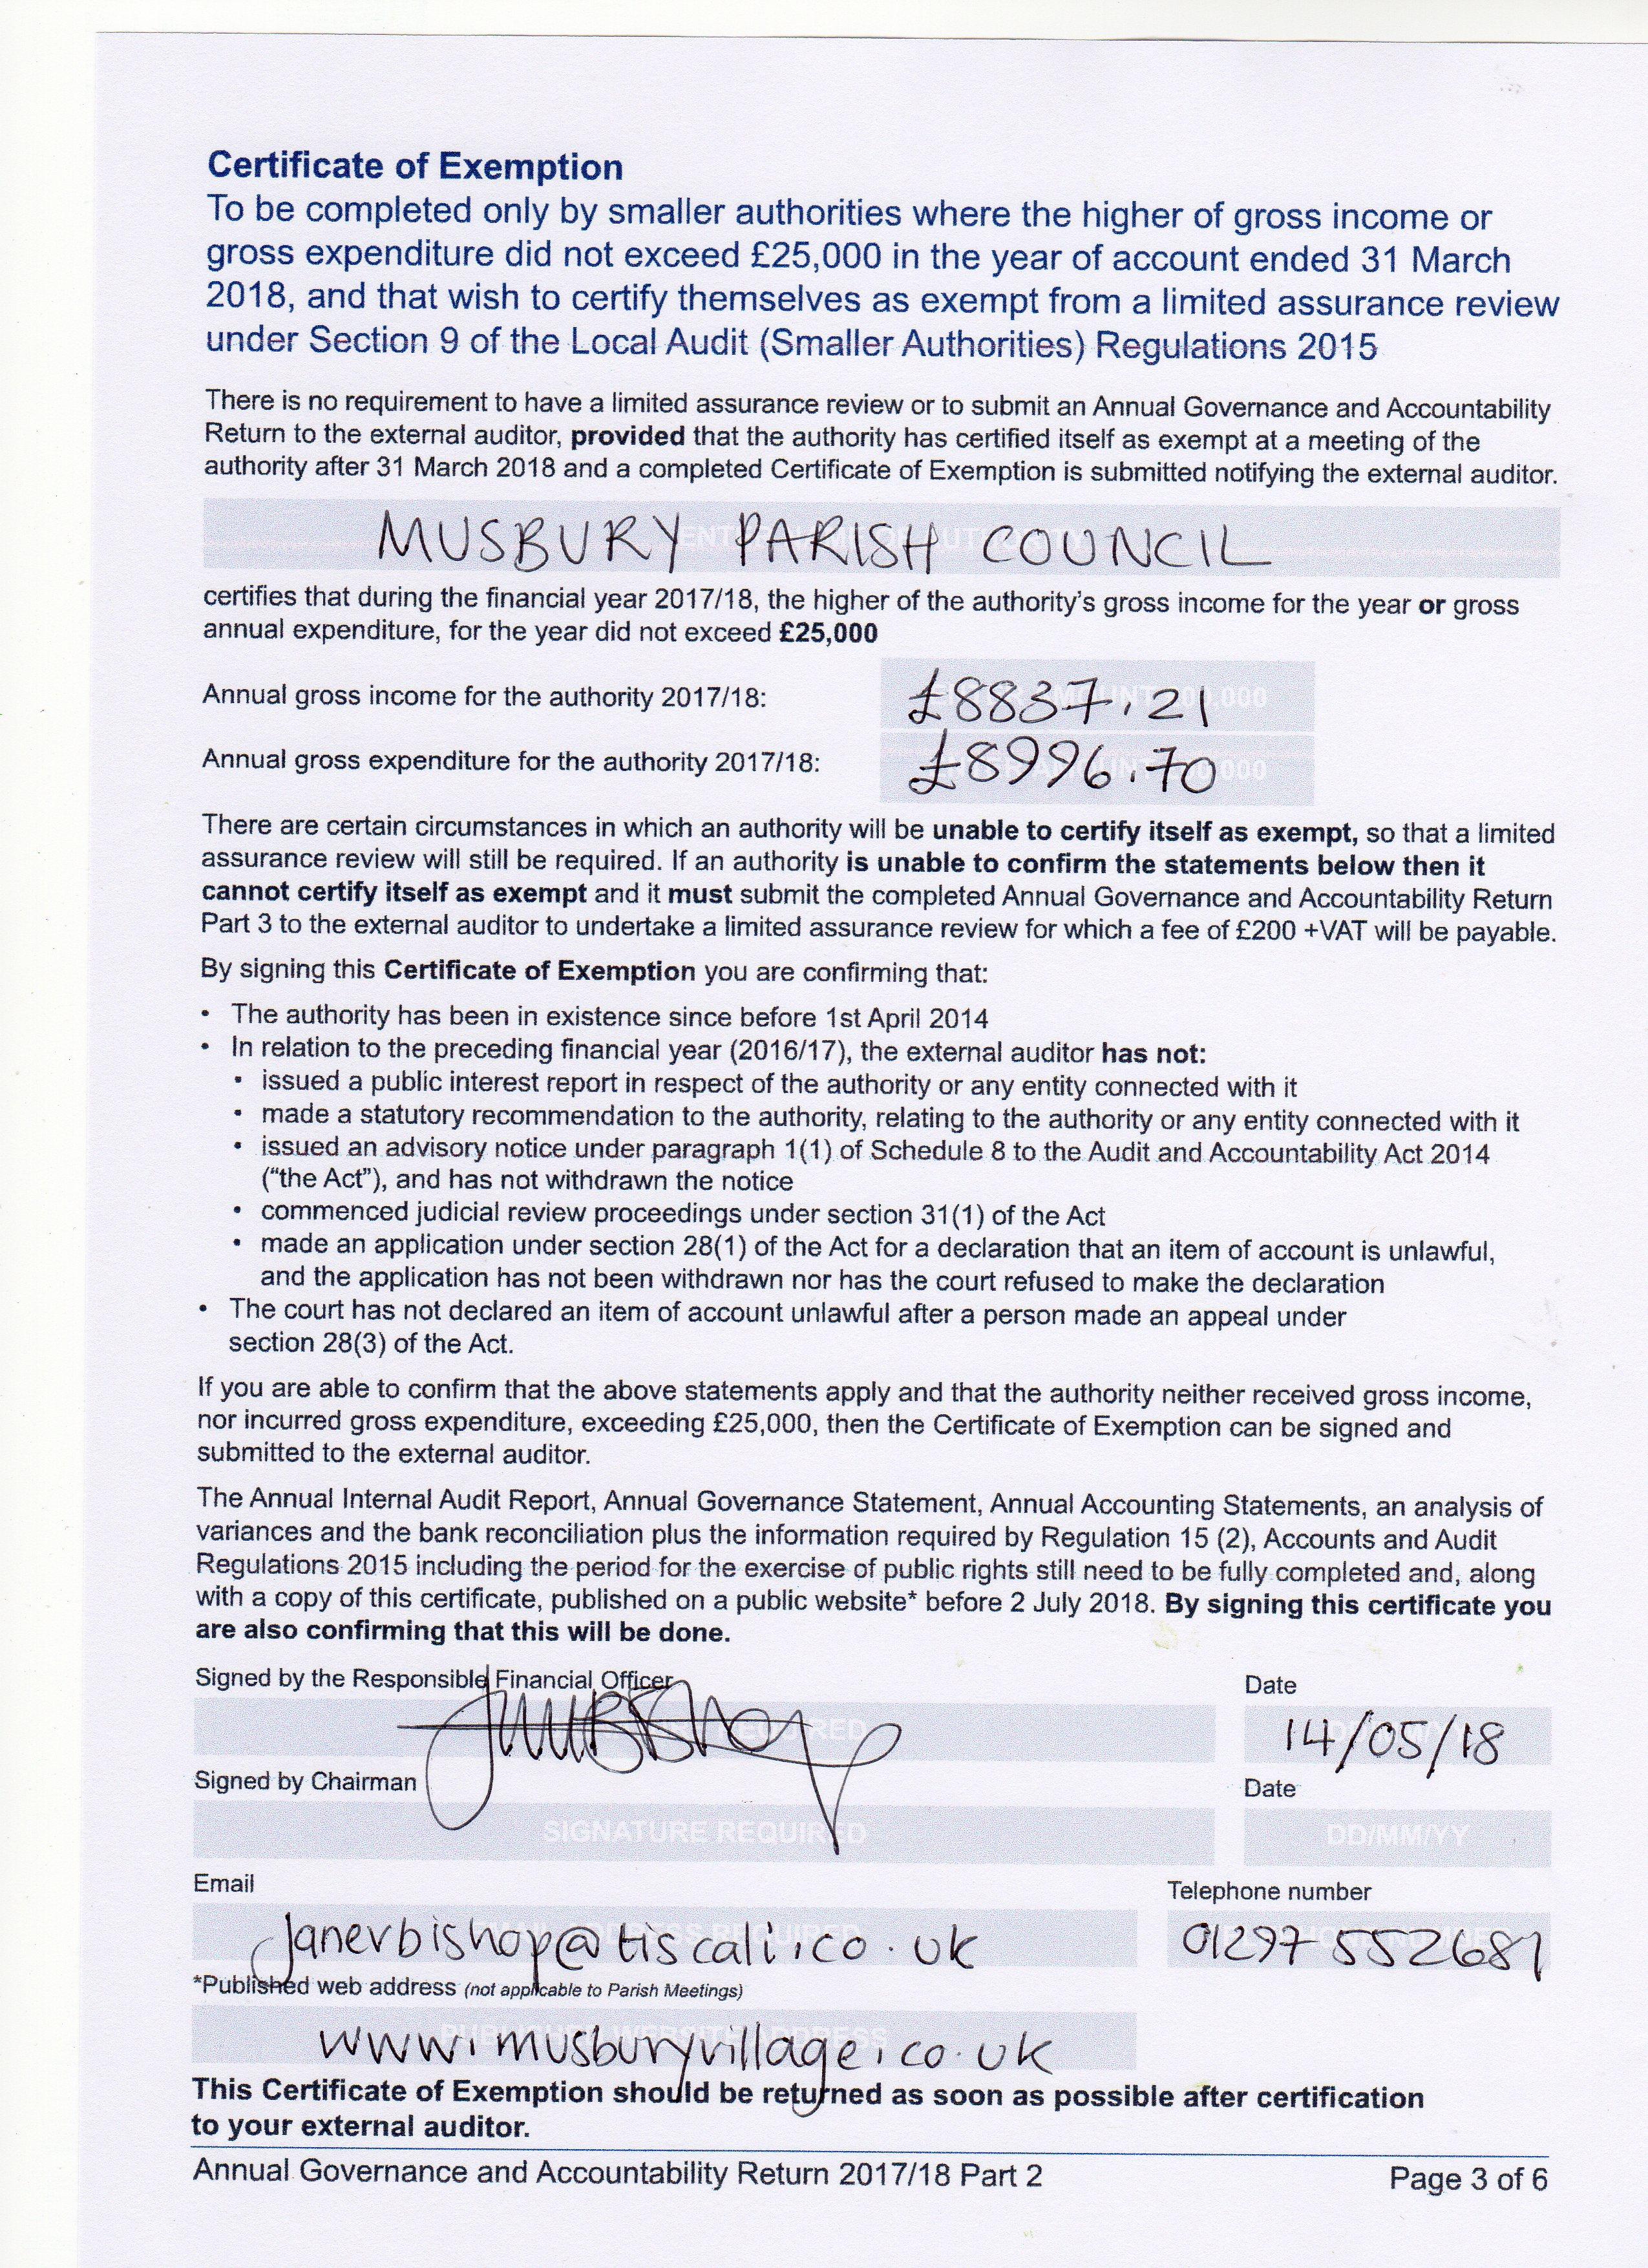 Parish Council Accounts And Audits Musbury Village